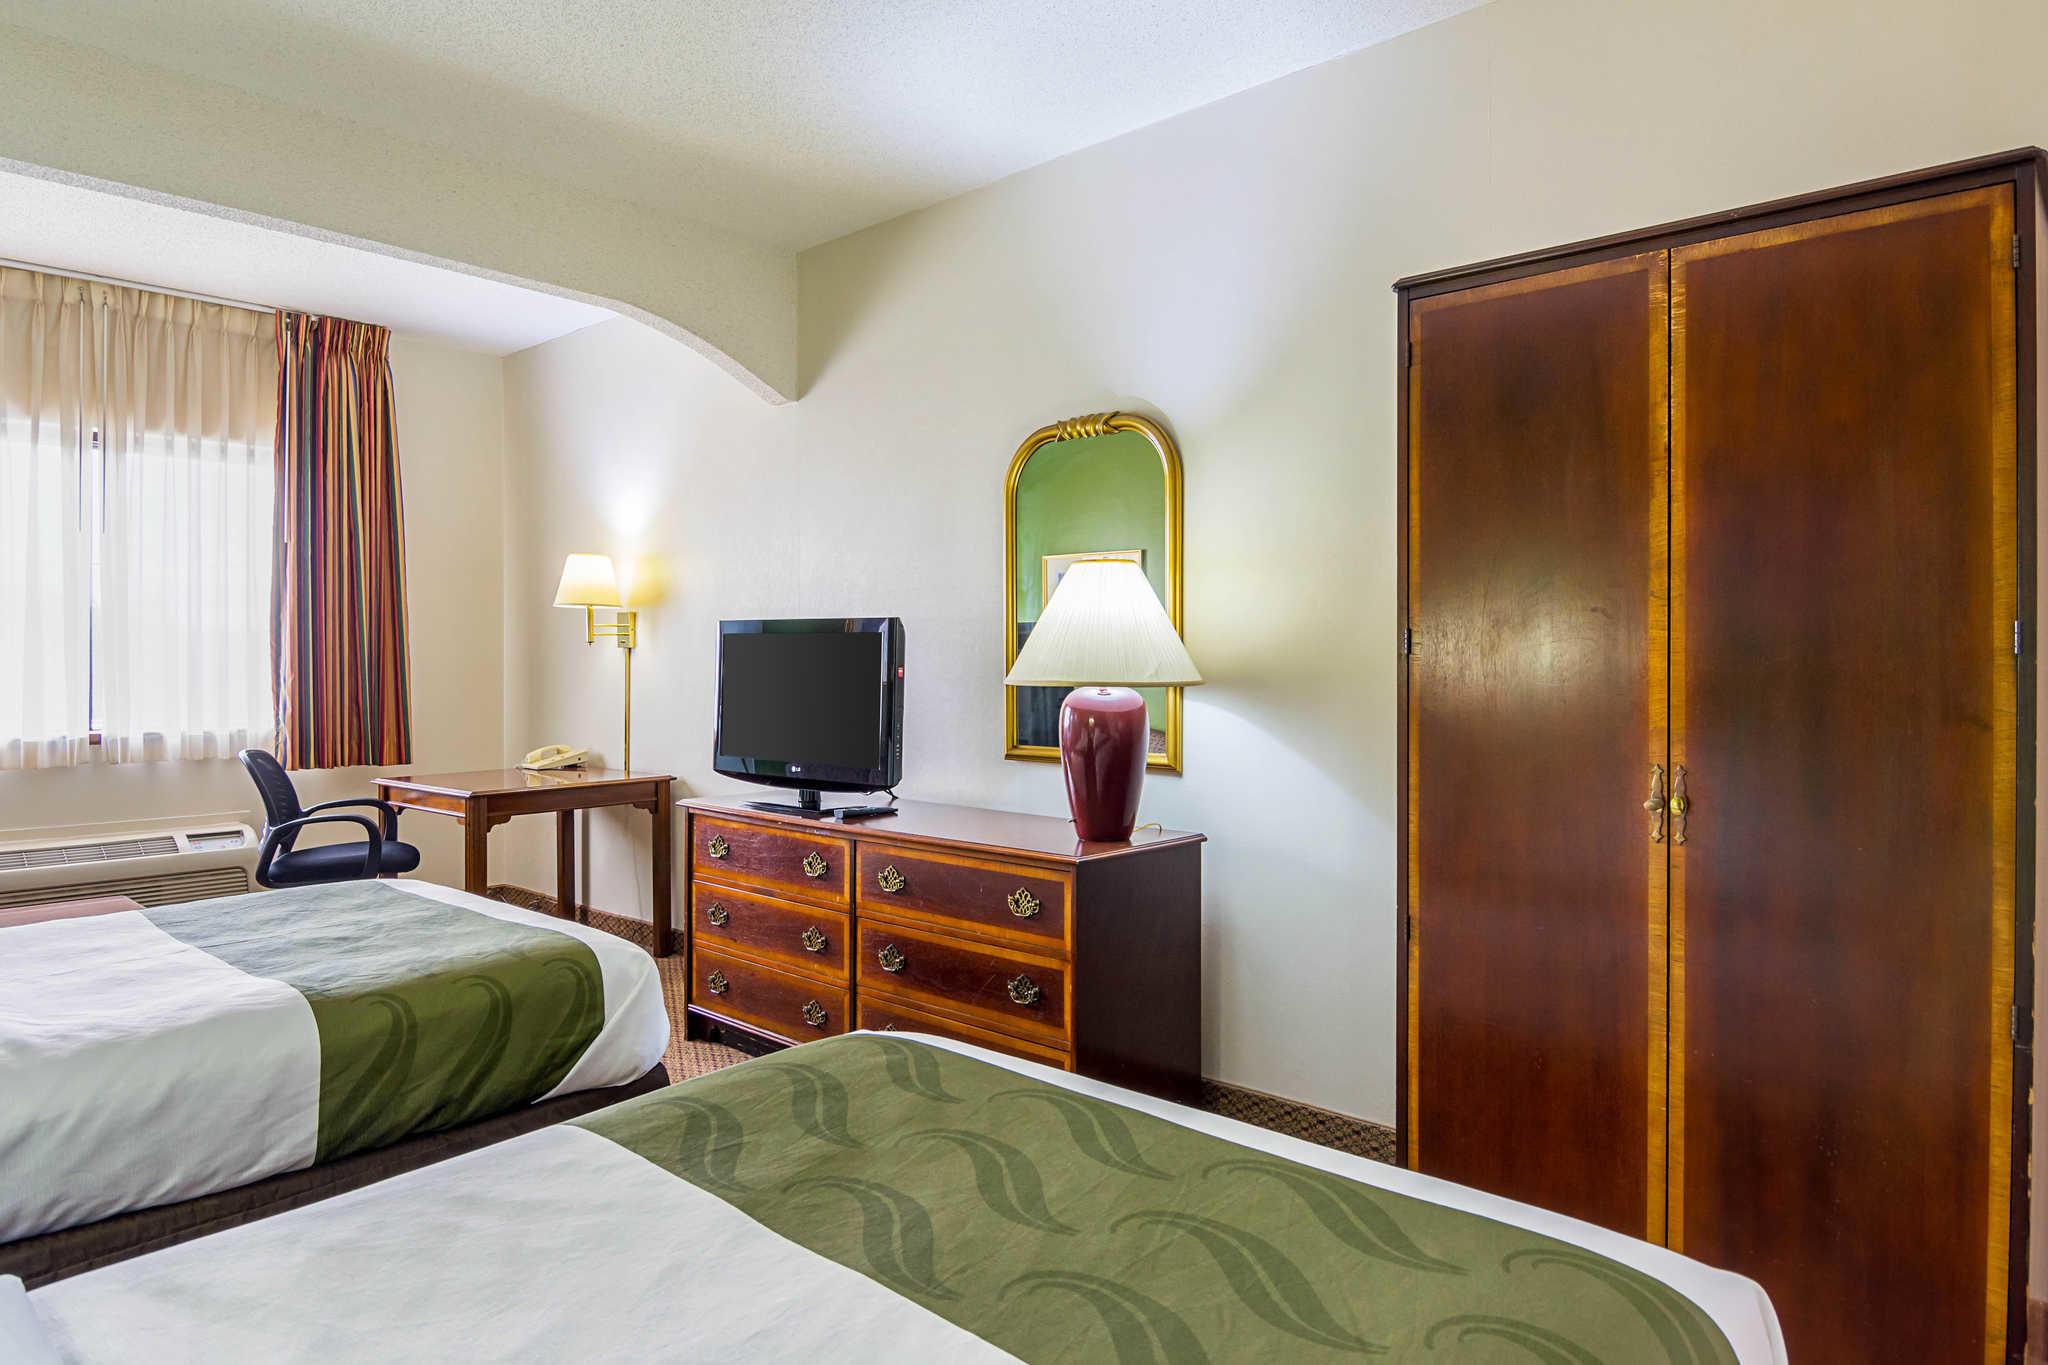 Quality Inn & Suites Kearneysville - Martinsburg image 8